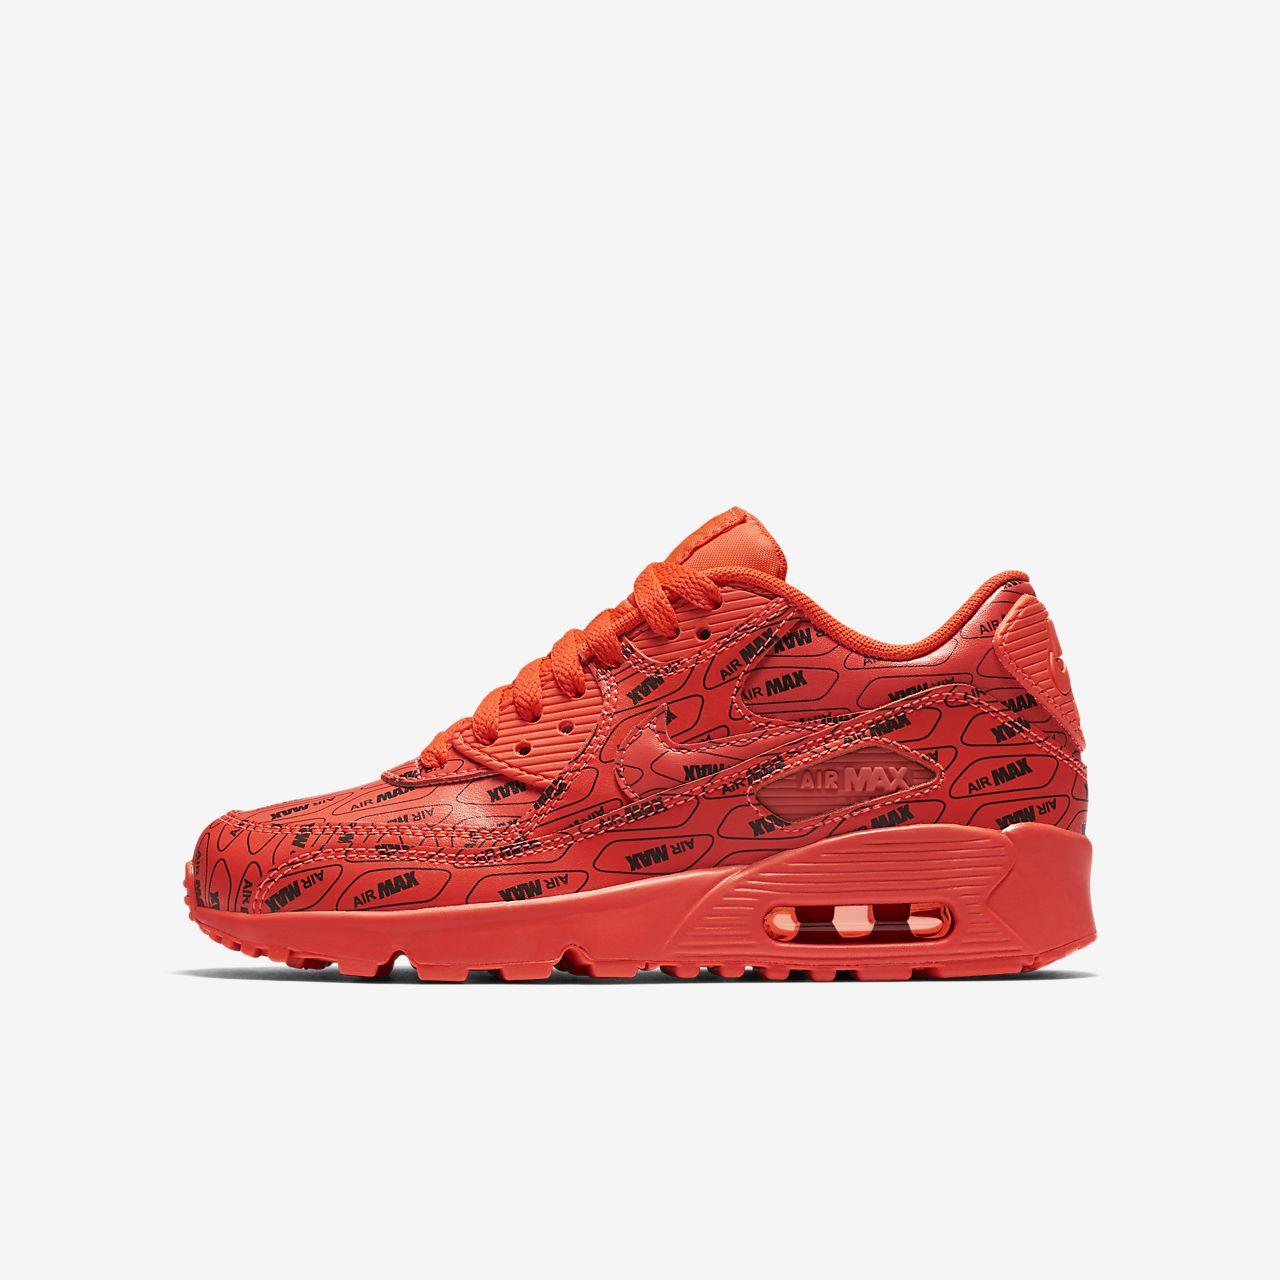 quality design d5e42 681c3 ... authentic nike air max 90 se leather sko til store børn 08327 ec940